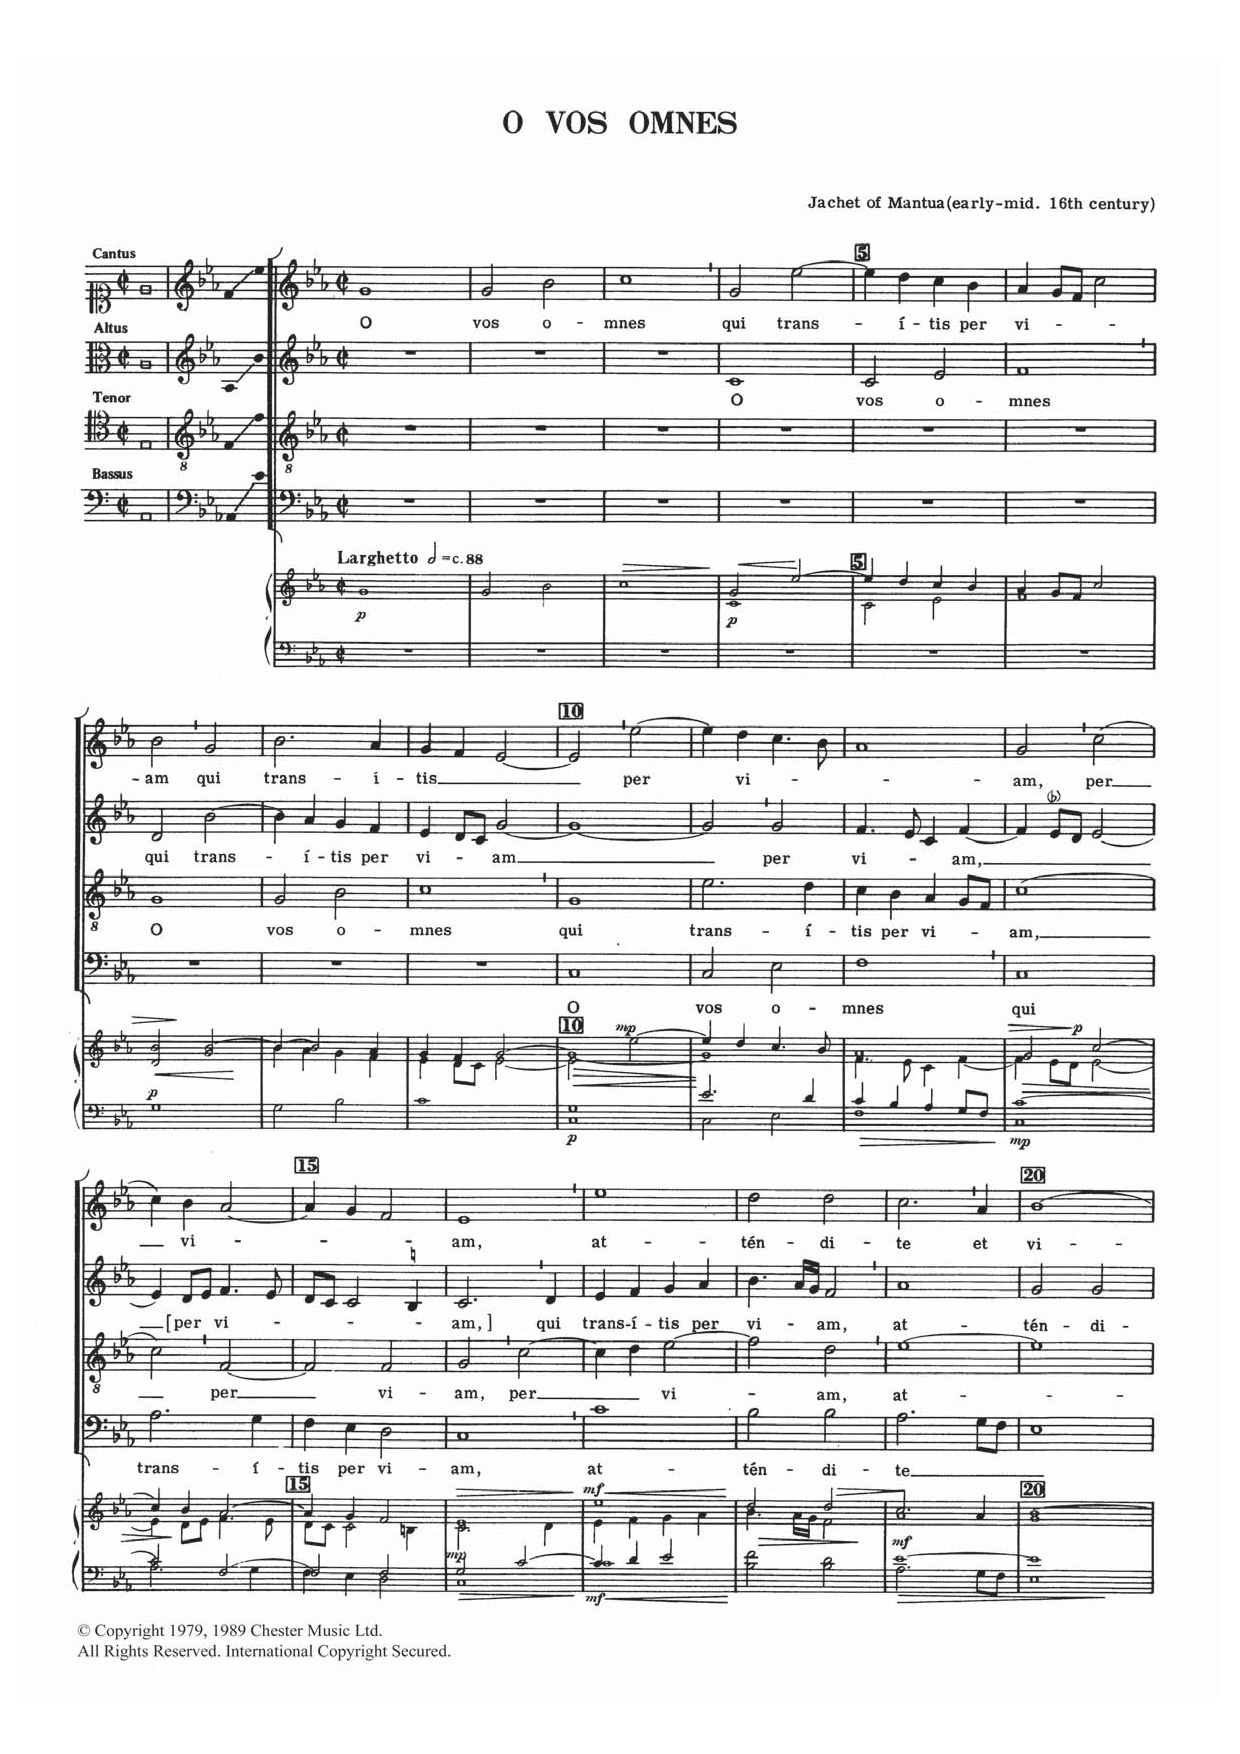 Jachet of Mantua - O Vos Omnes